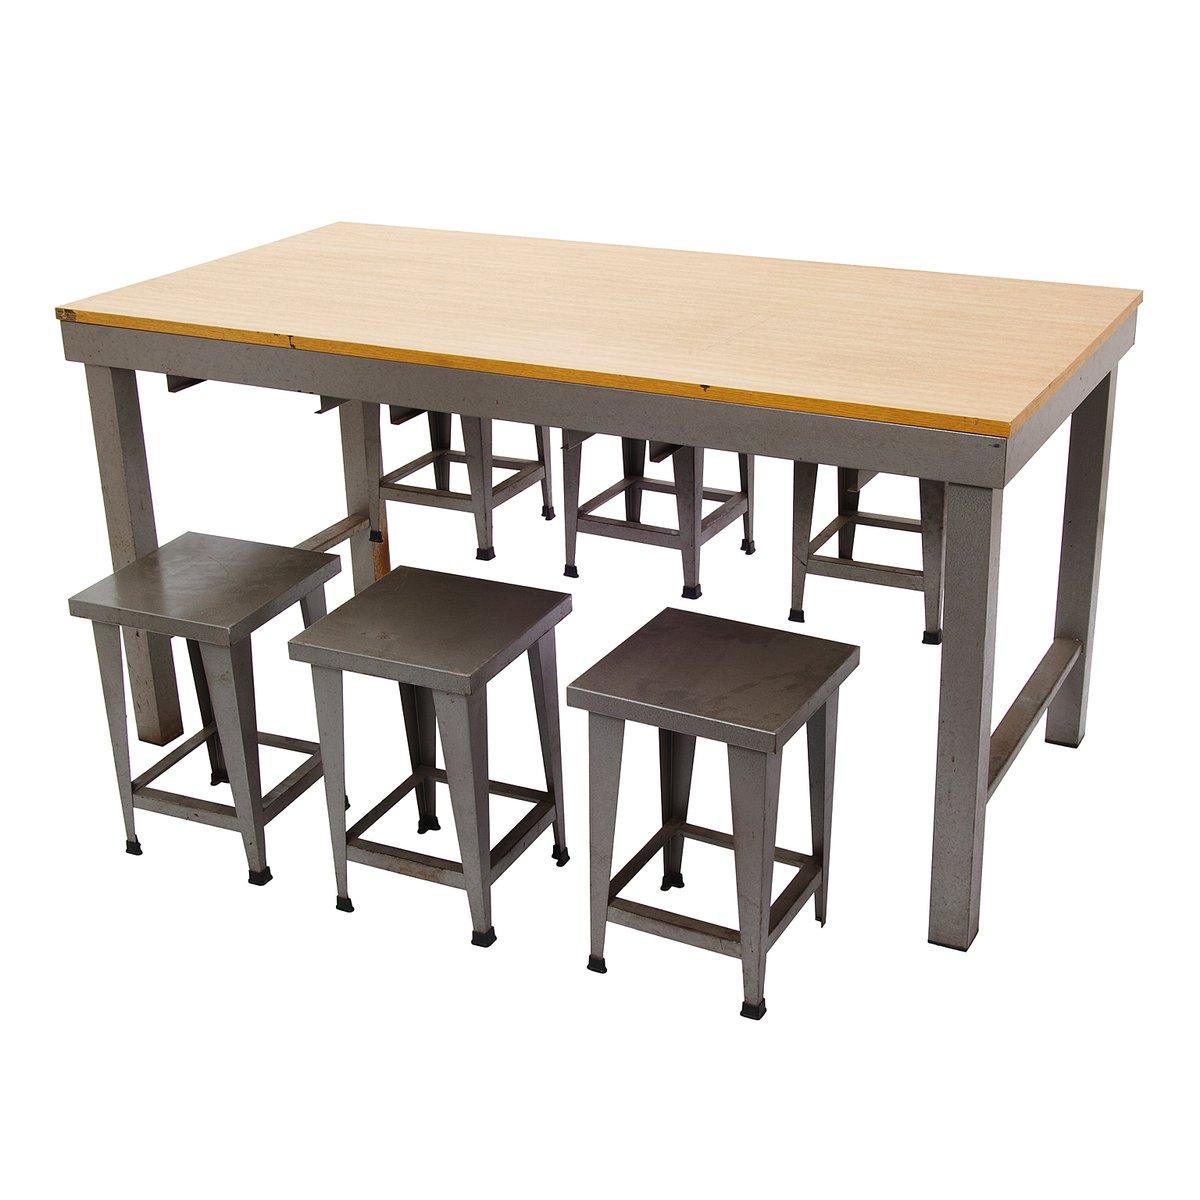 Tavolo con sgabelli vintage in stile industriale in - Tavolo stile industriale ...